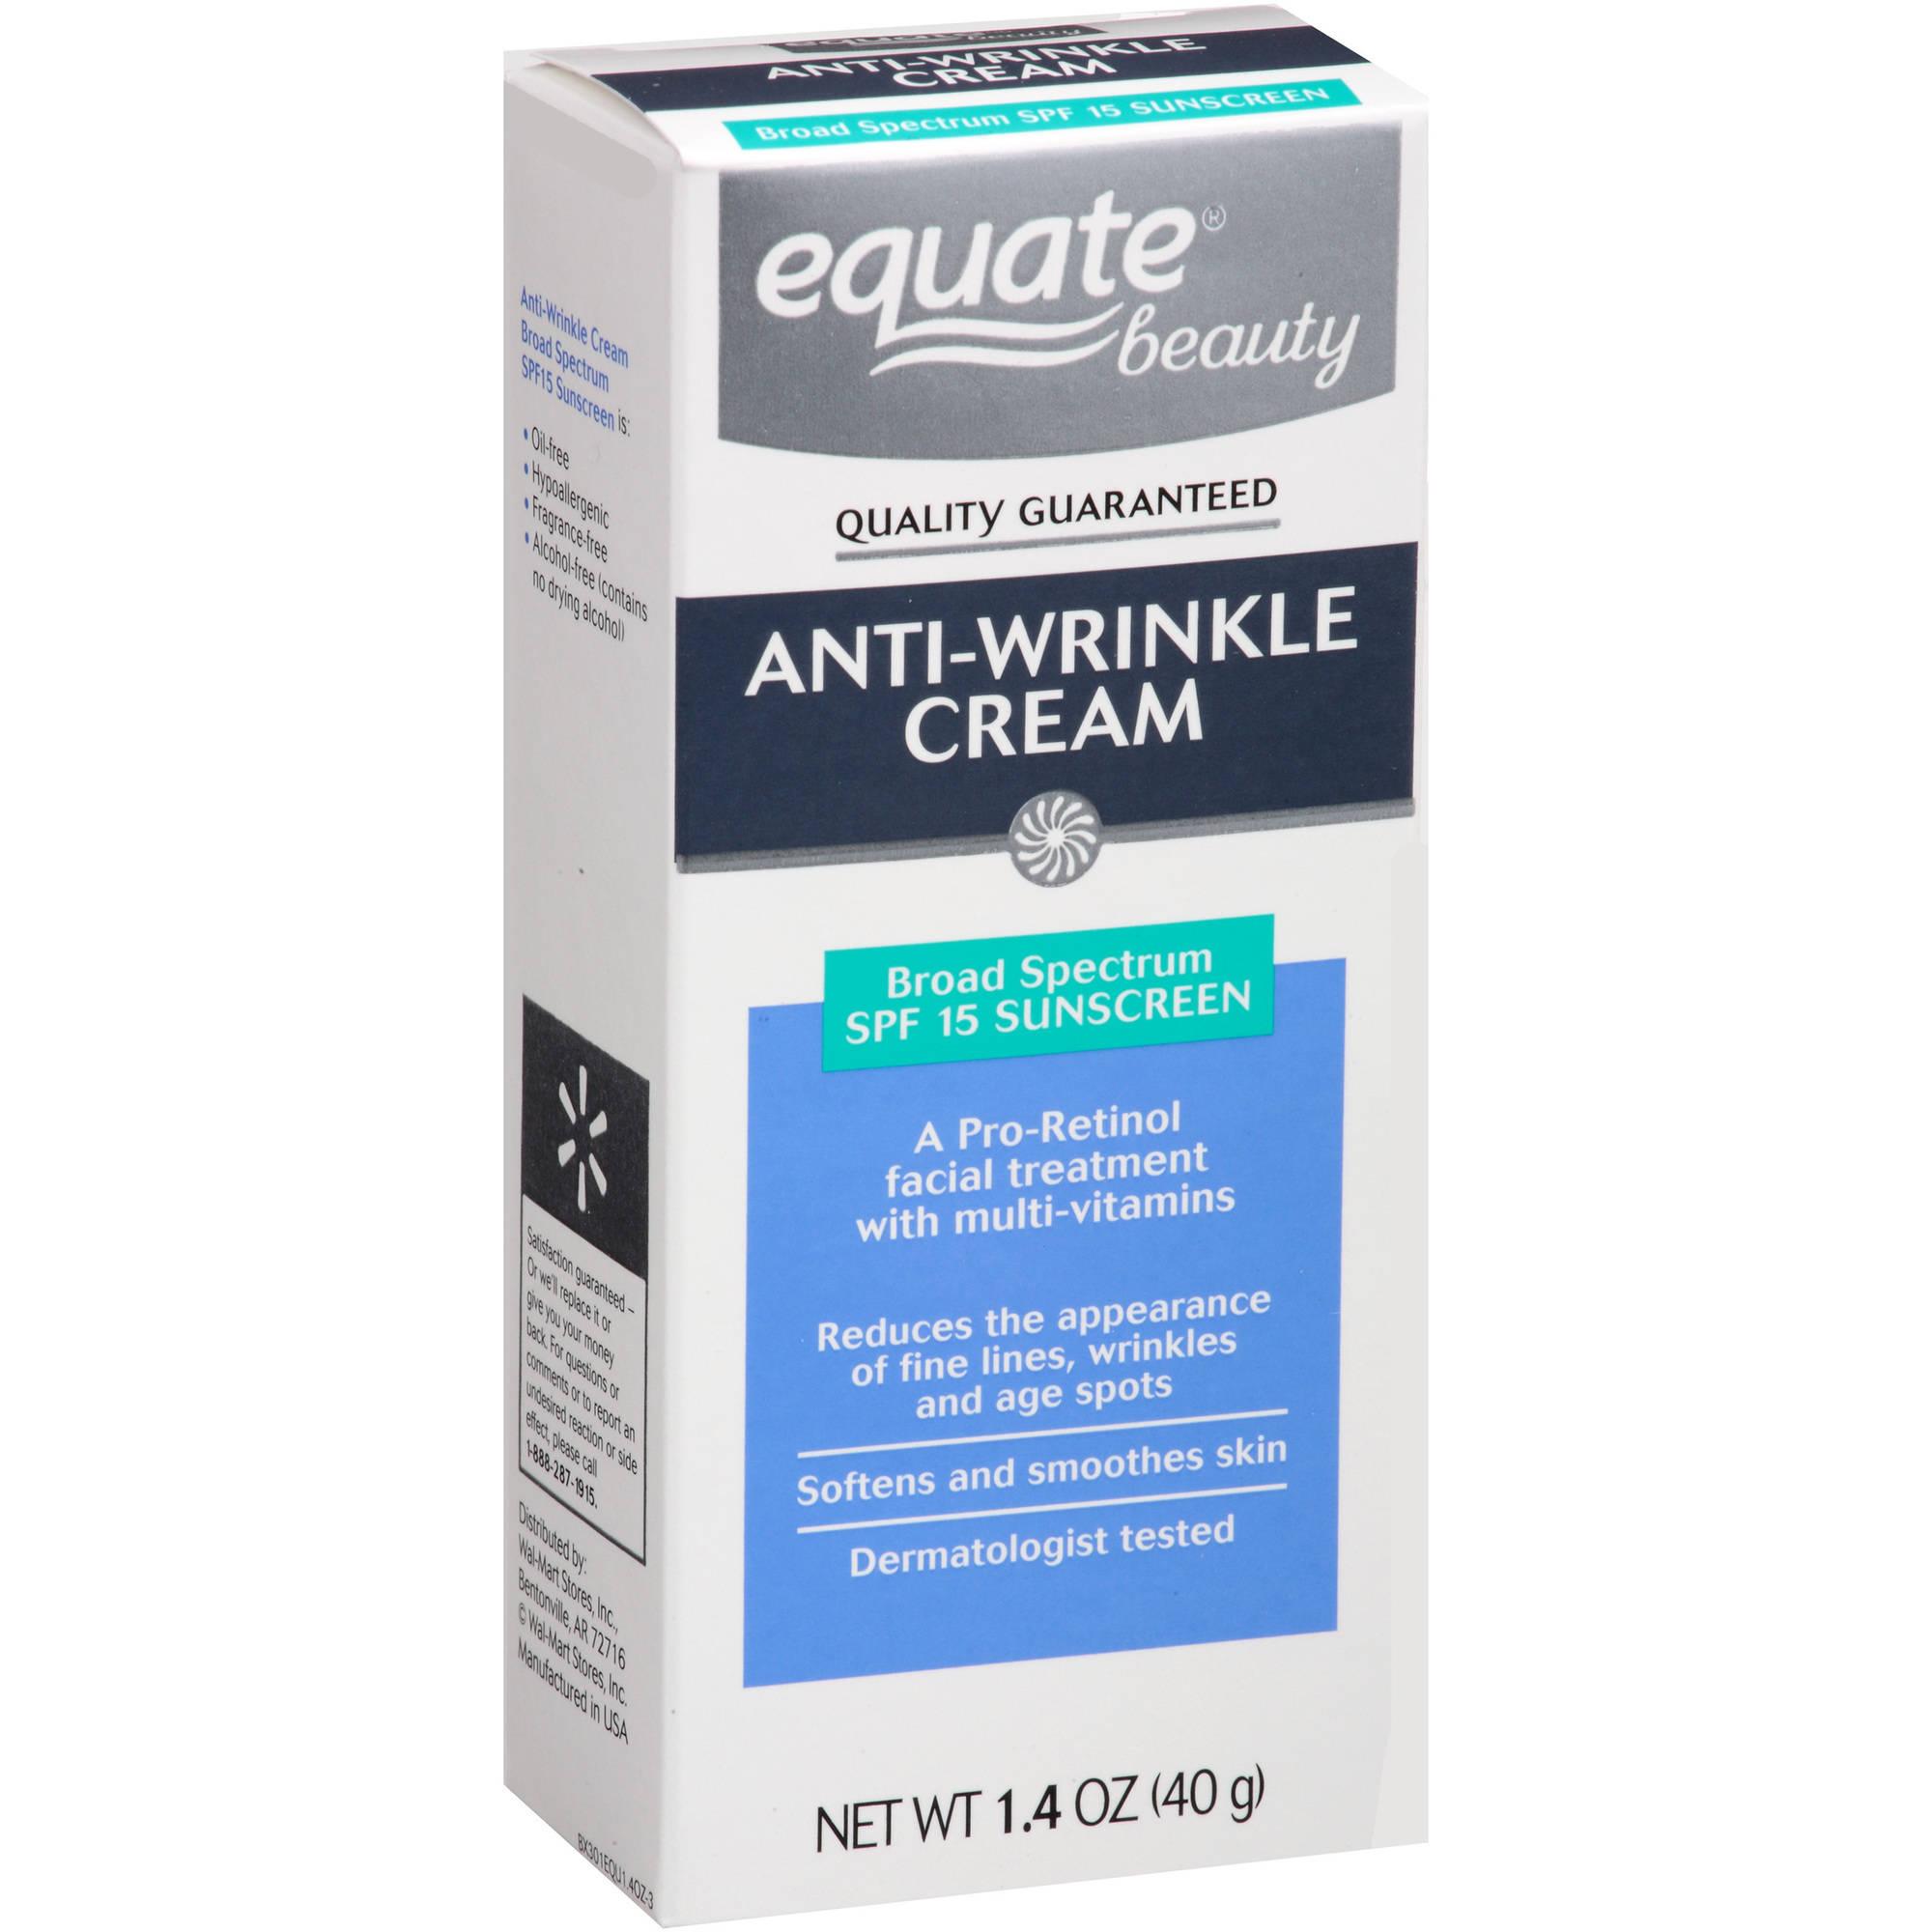 Equate Beauty Anti-Wrinkle Cream, SPF 15, 1.4 oz